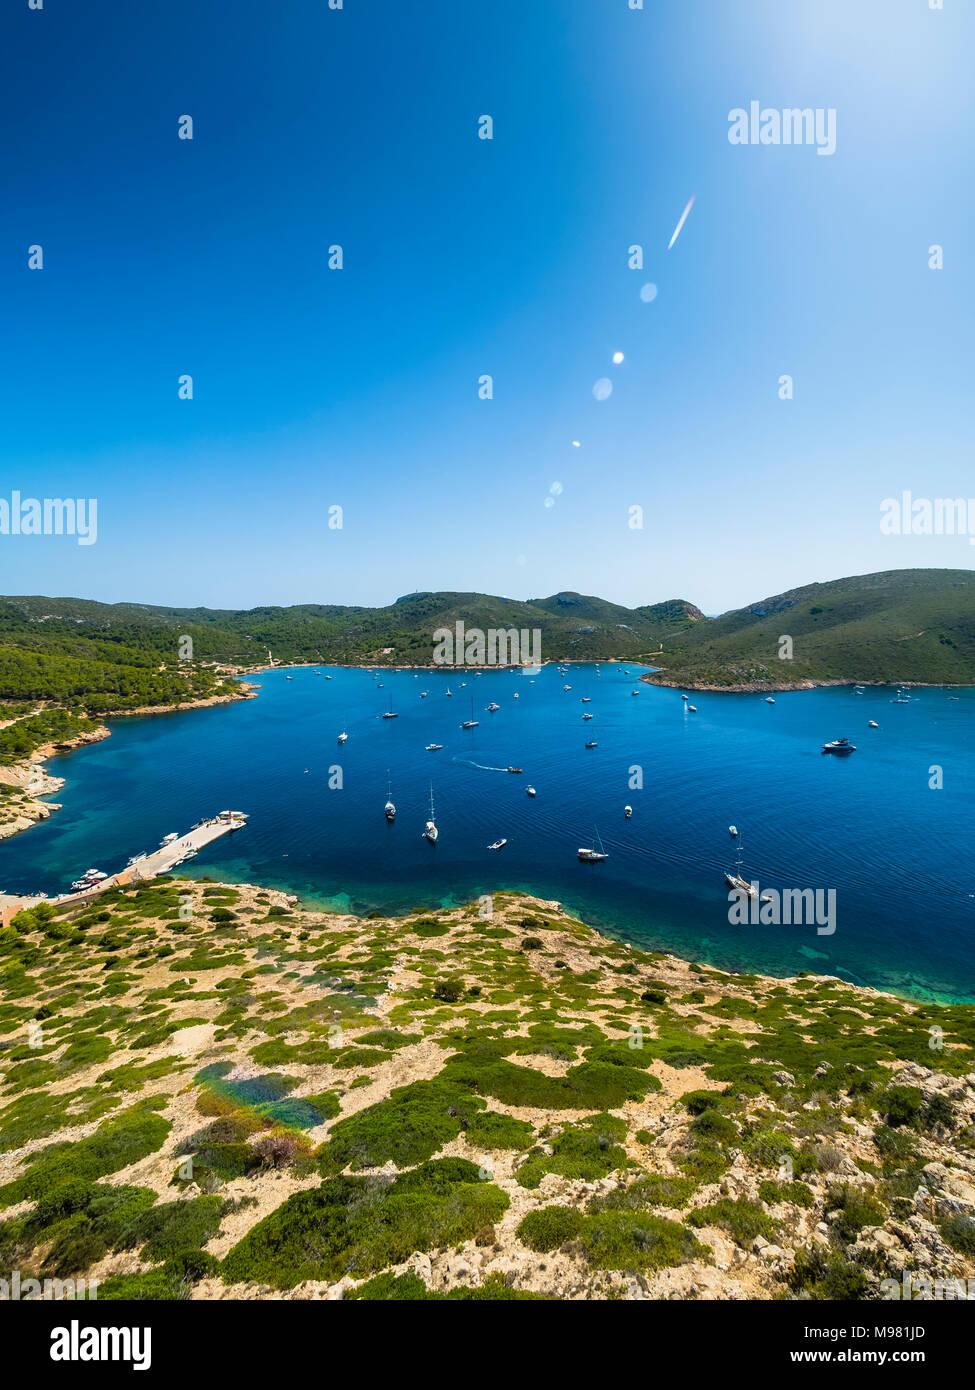 Spanien, Balearen, Mallorca, Colònia de Sant Jordi, Parque Nacional de Cabrera, Cabrera-Nationalpark, Cabrera-Archipel, Hafen und Lagune von Cabrera - Stock Image